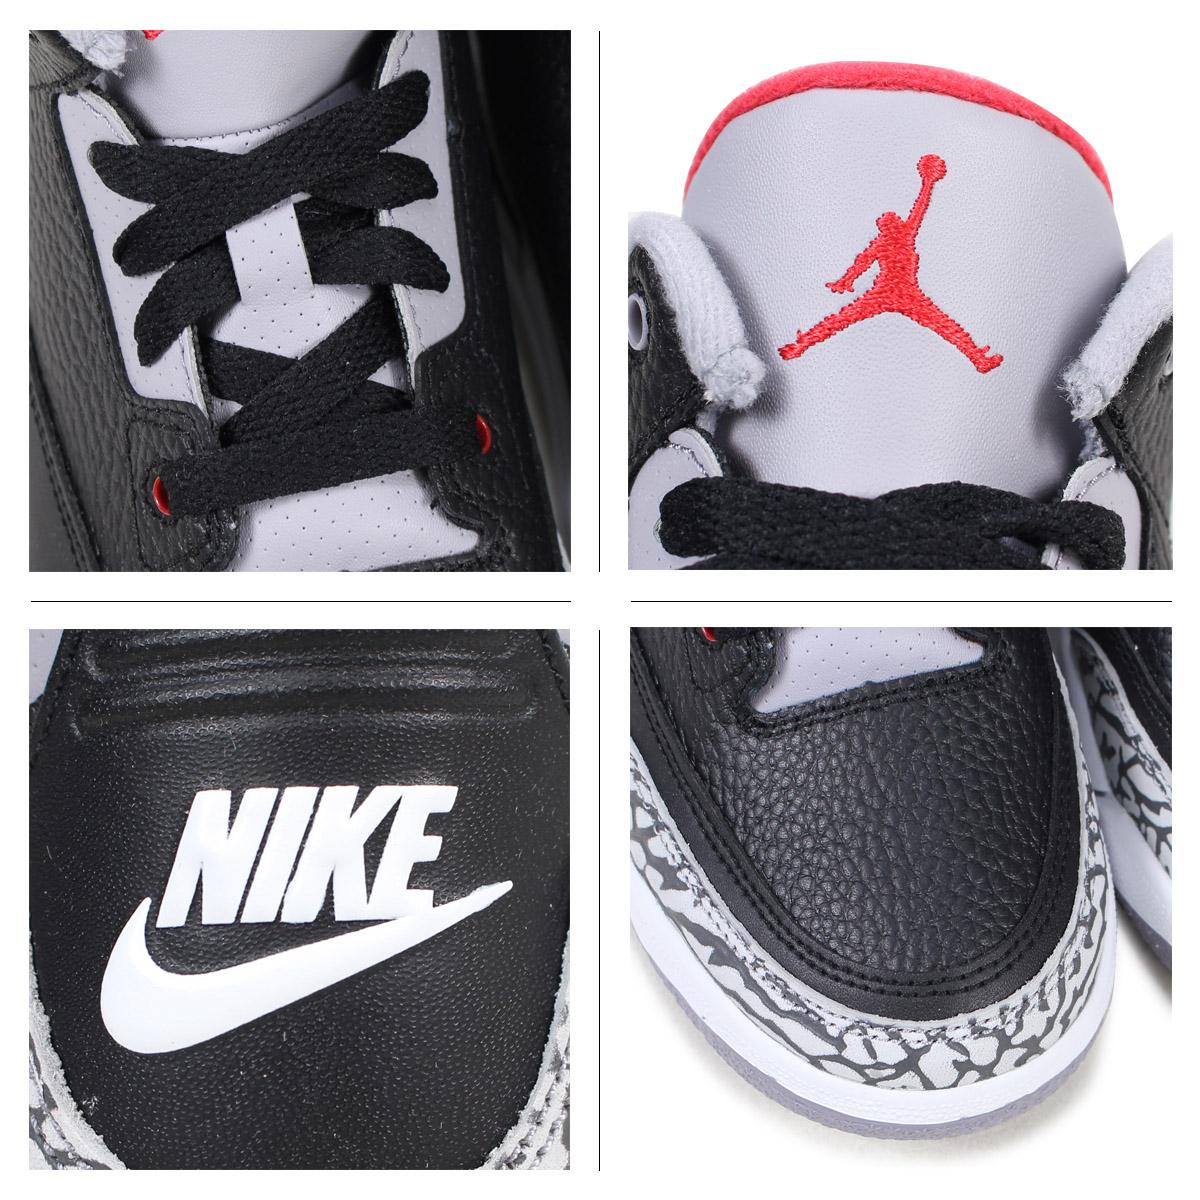 ddb297e3055 ... NIKE AIR JORDAN 3 RETRO BP Nike Air Jordan 3 nostalgic kids sneakers  429,487-021